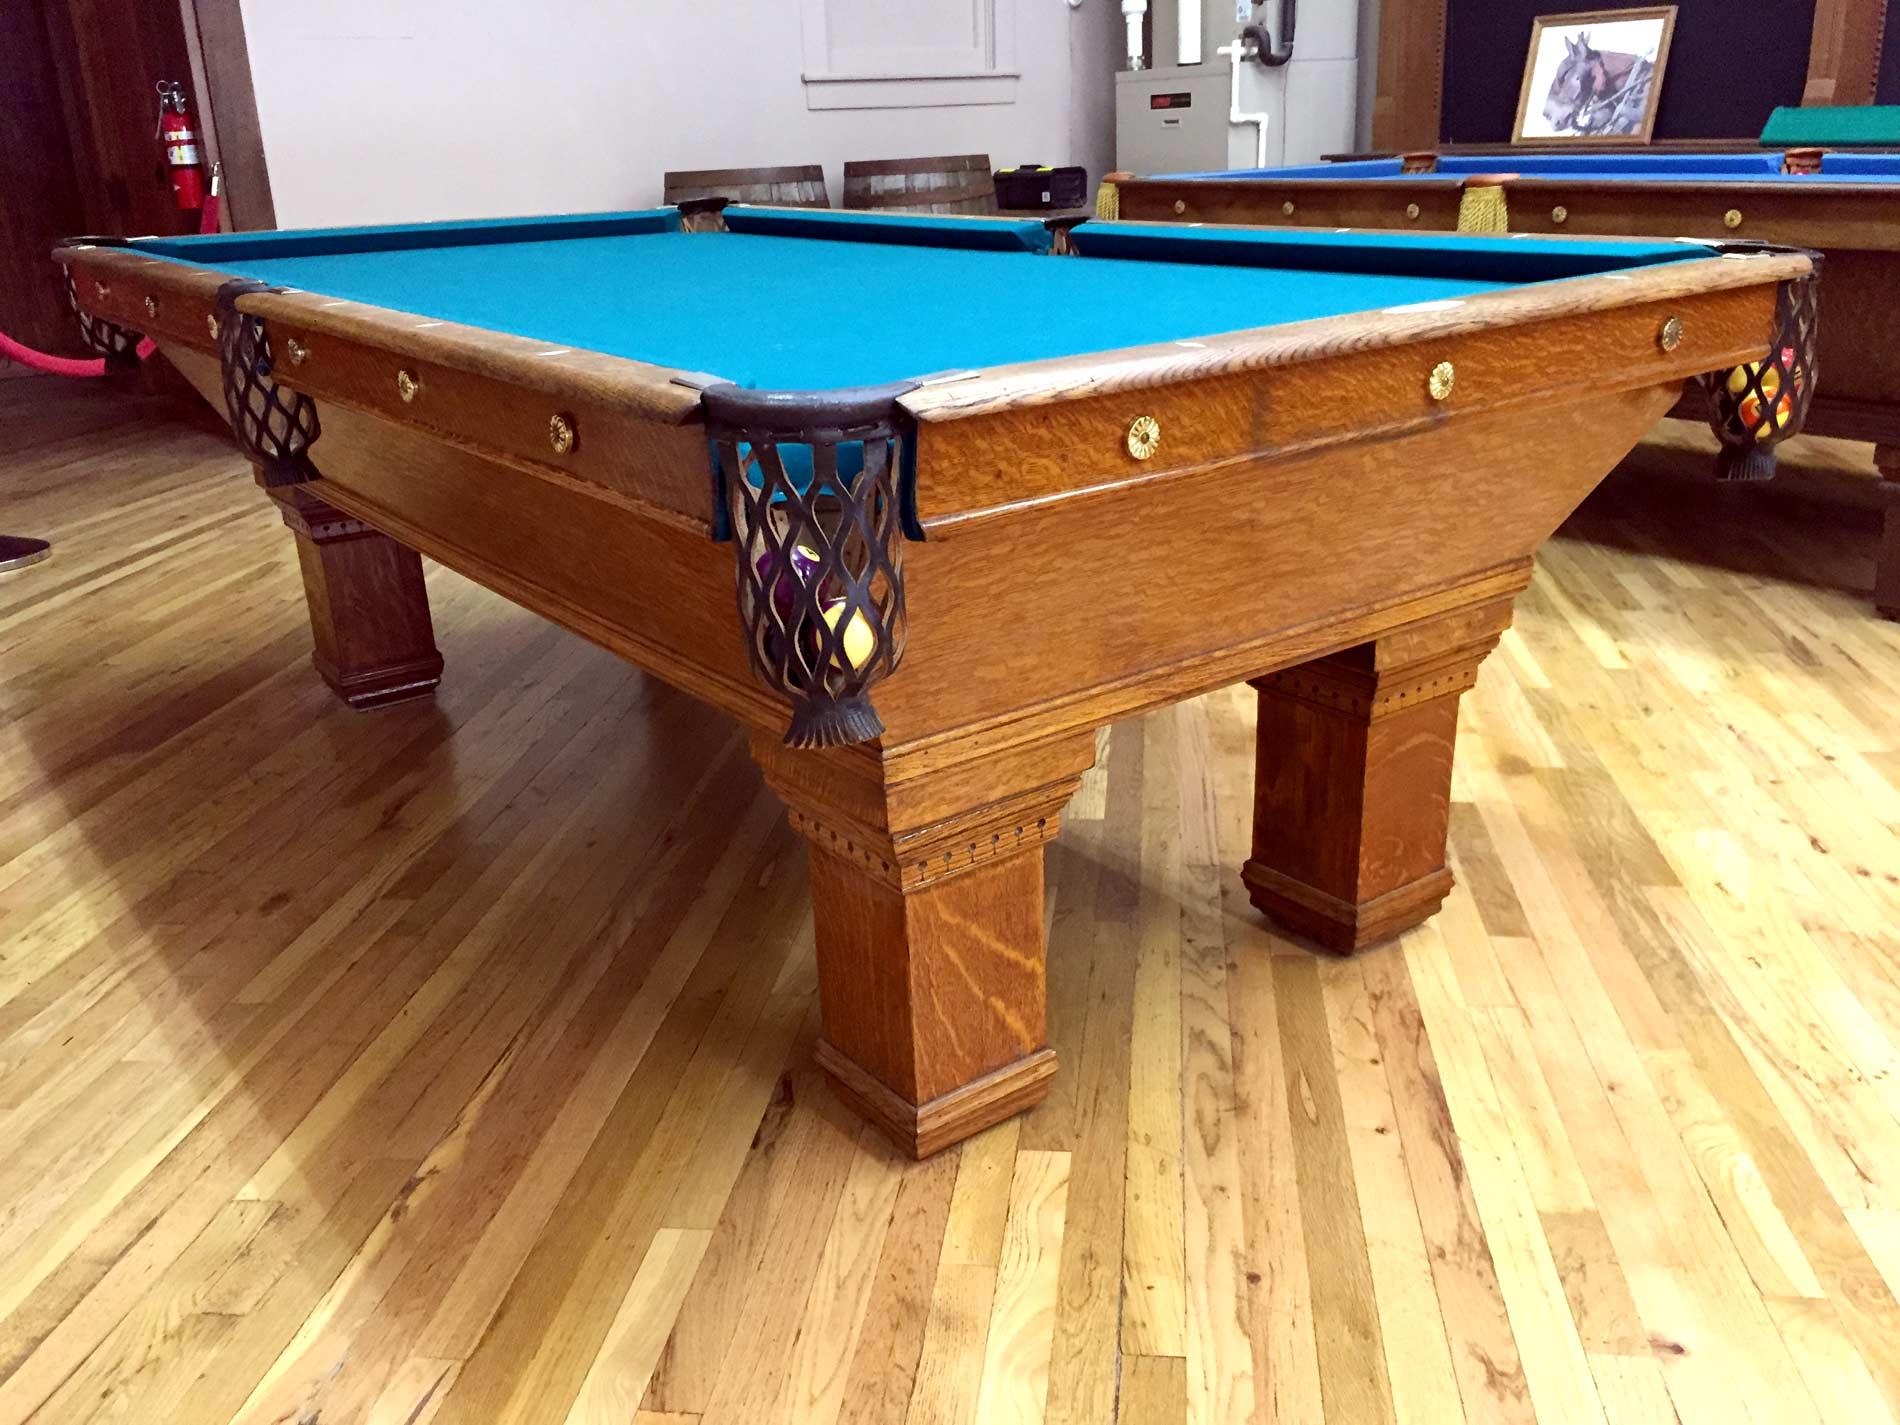 Cowboy Billiards Antique Brunswick Pool Table - Brunswick chateau pool table